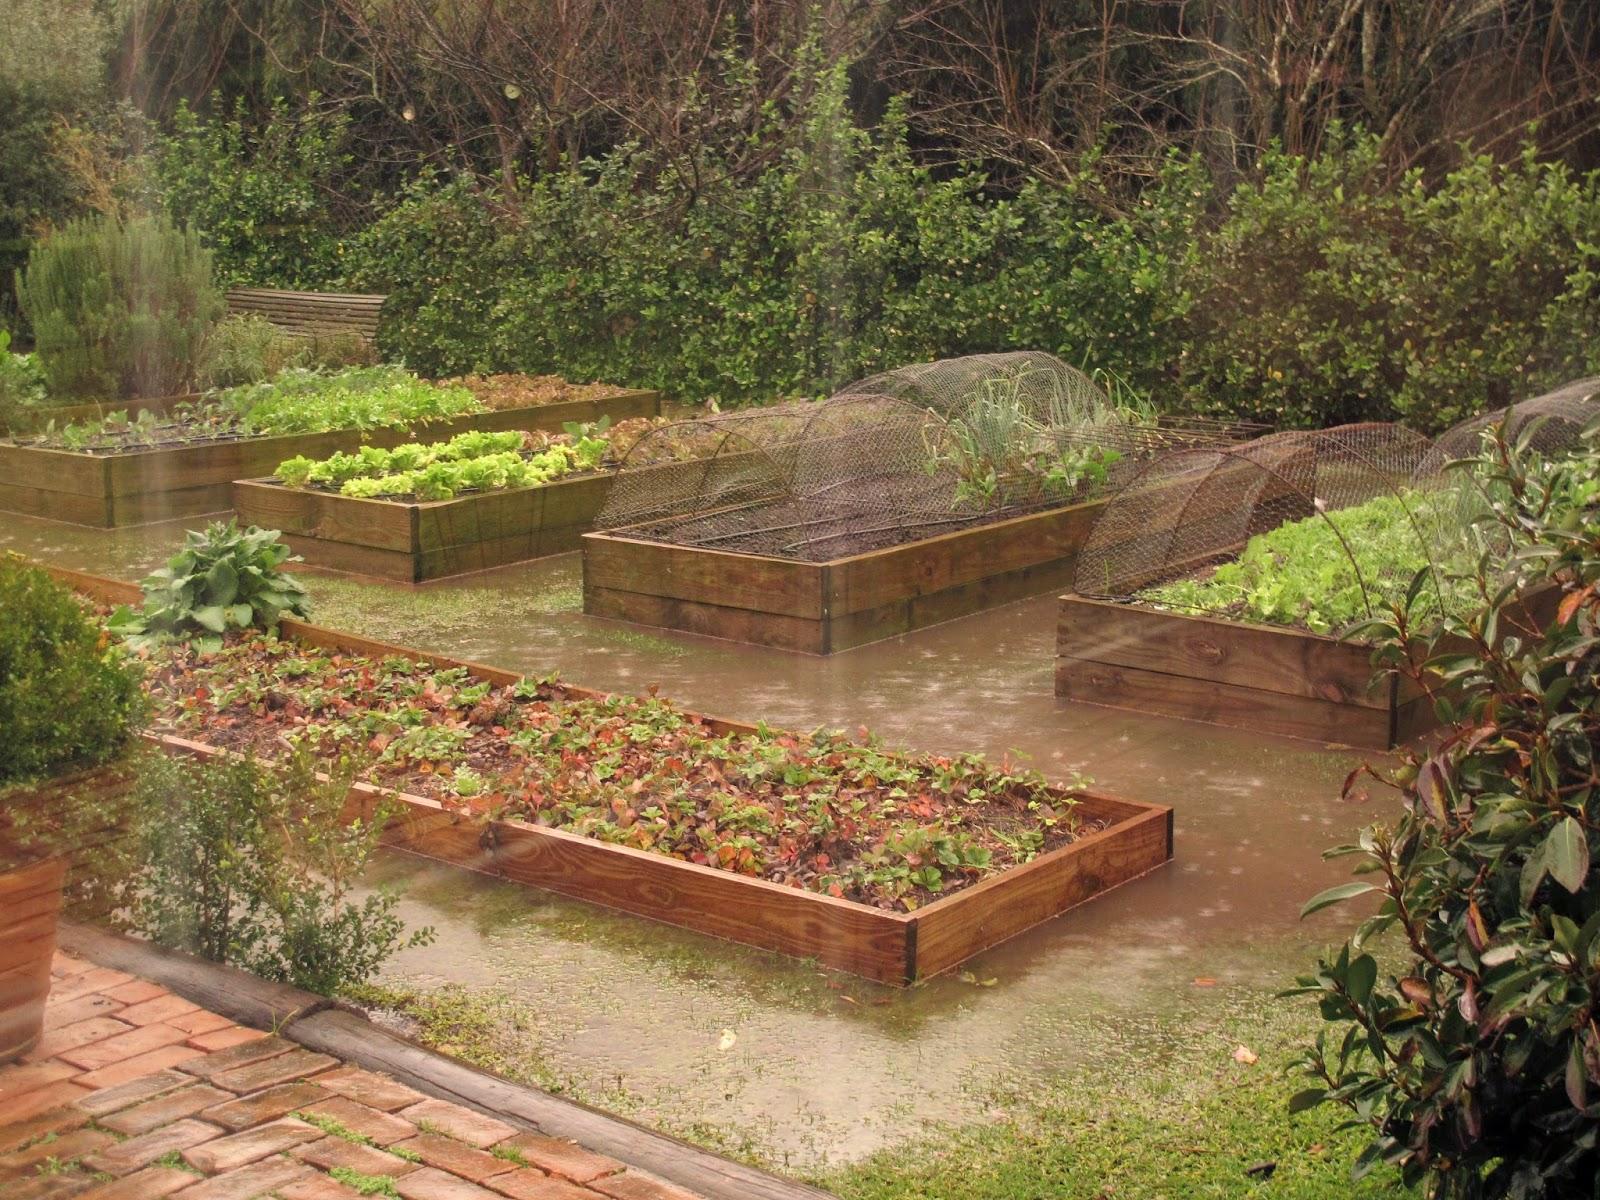 En el jardin huerta elevada for Piscina huerta de lara